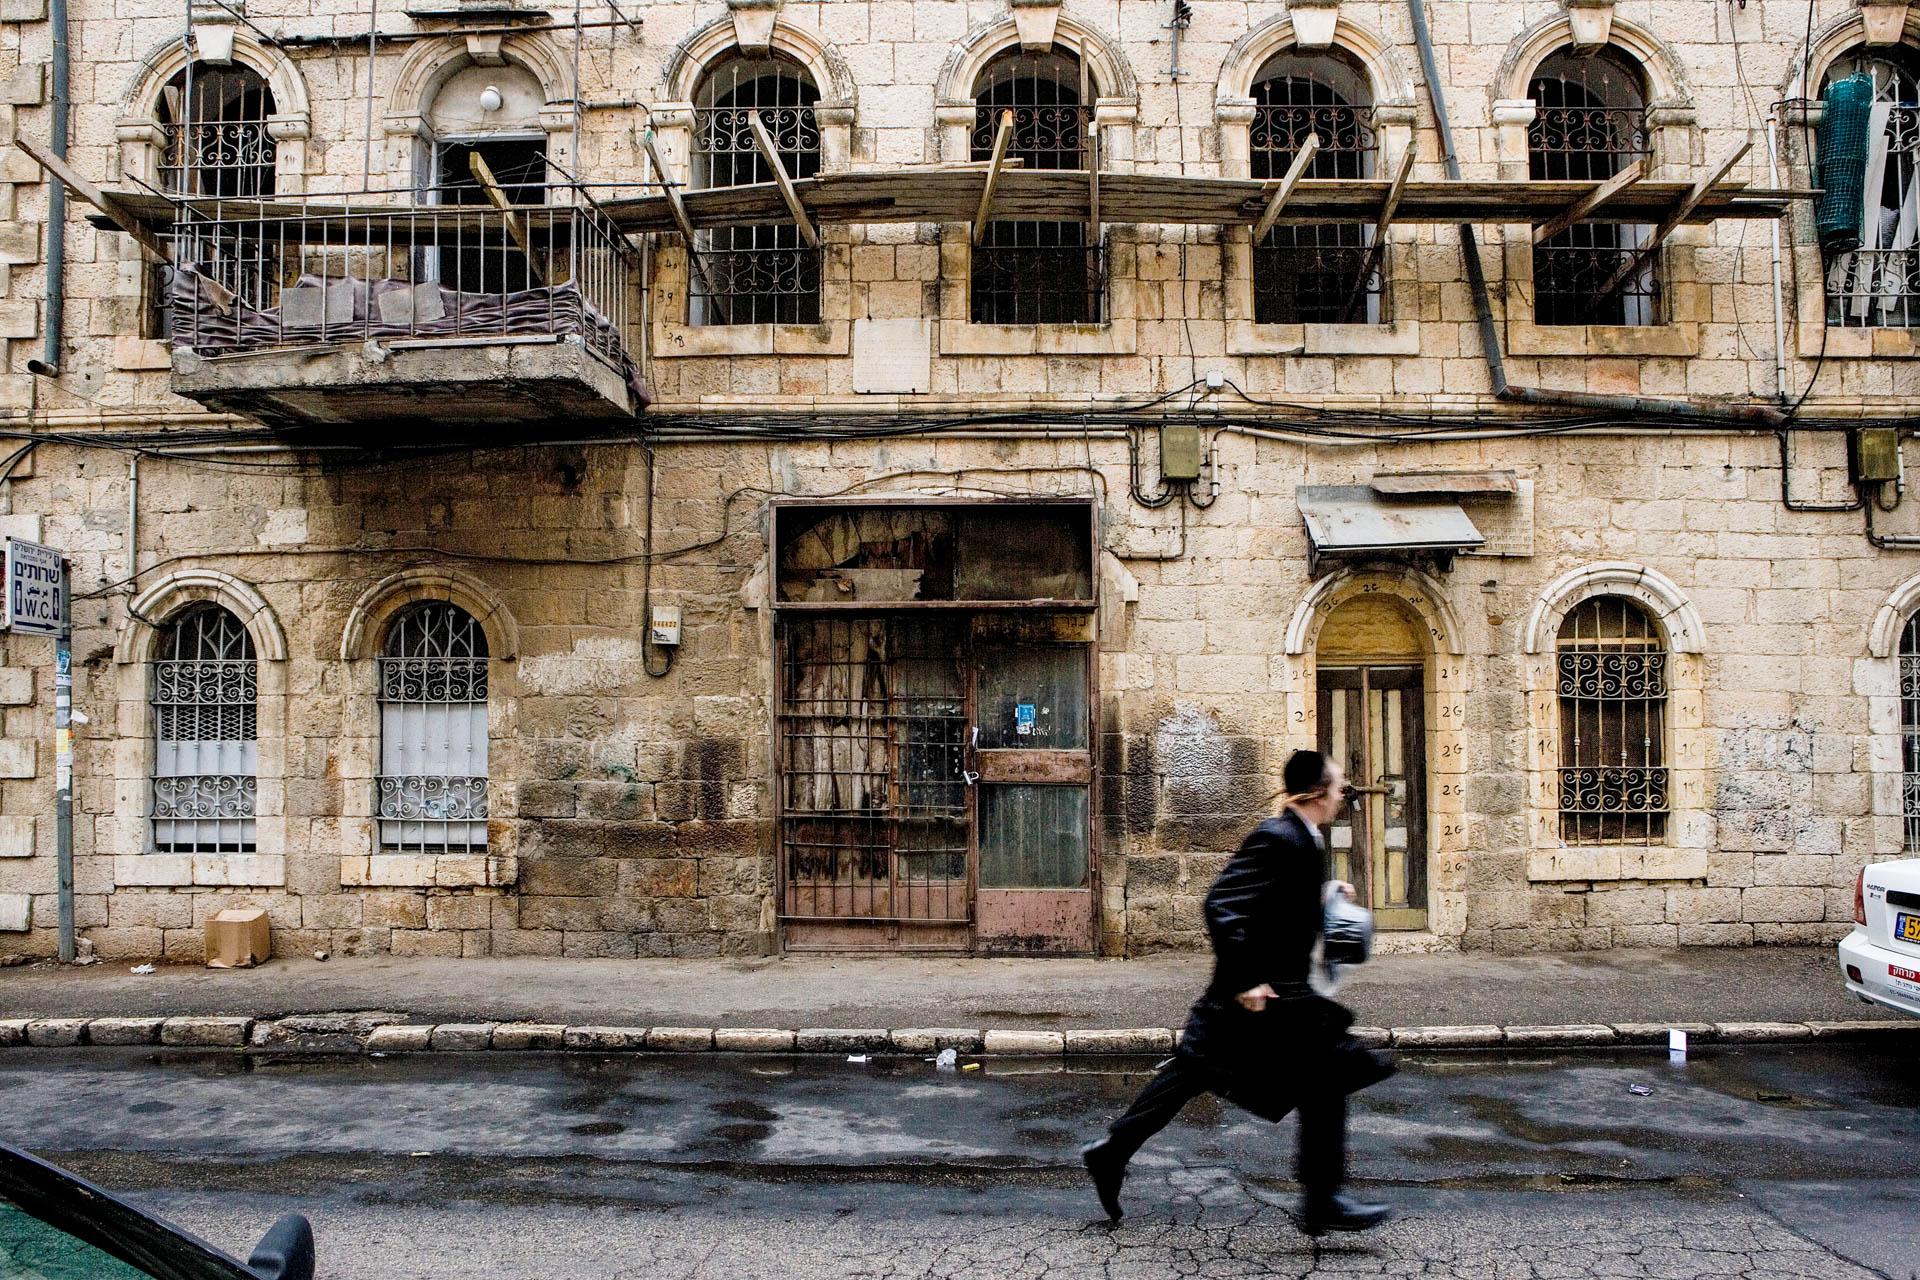 Jerusalem, Israel - 19 October 2005Daily life at Mea Sh'arim, the most orthodox quarter in Israel.© GIANNI GIANSANTI